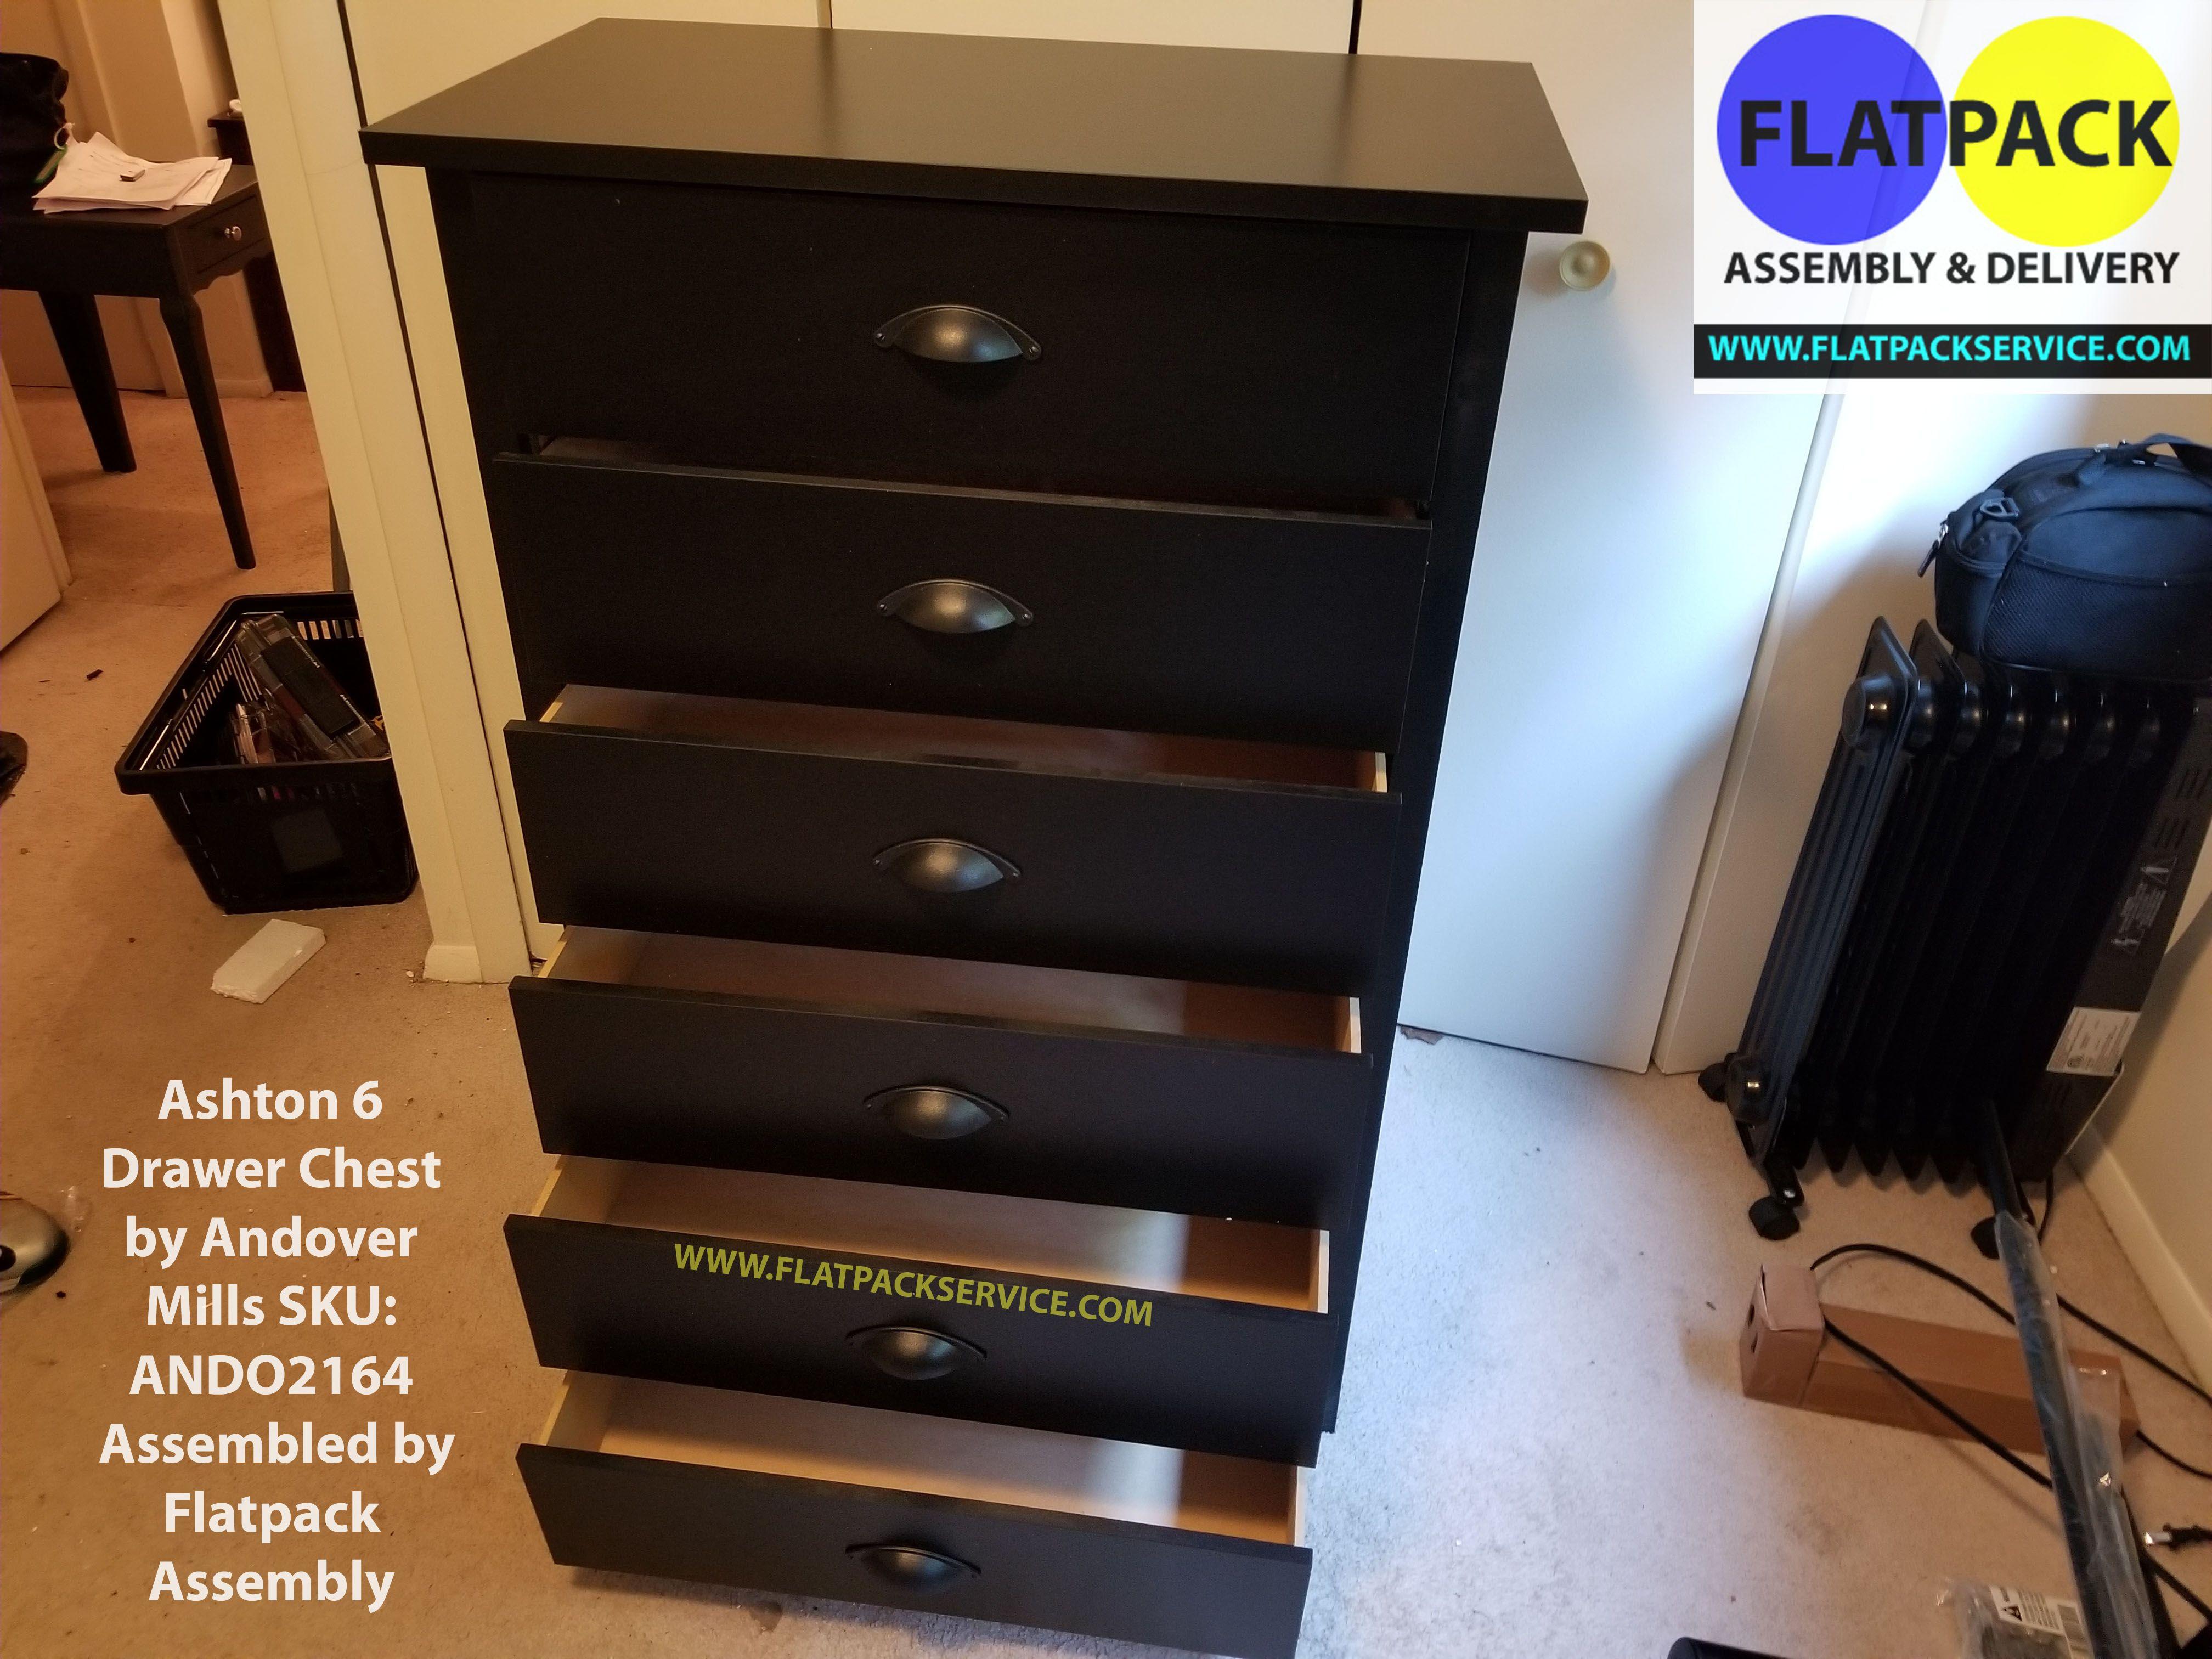 Best 10 Furniture Assembly In Reston Va 202 277 5911 Flatpack Assembly 20190 Same Day Service Ikea Furniture Assembly Furniture Assembly Wayfair Furniture